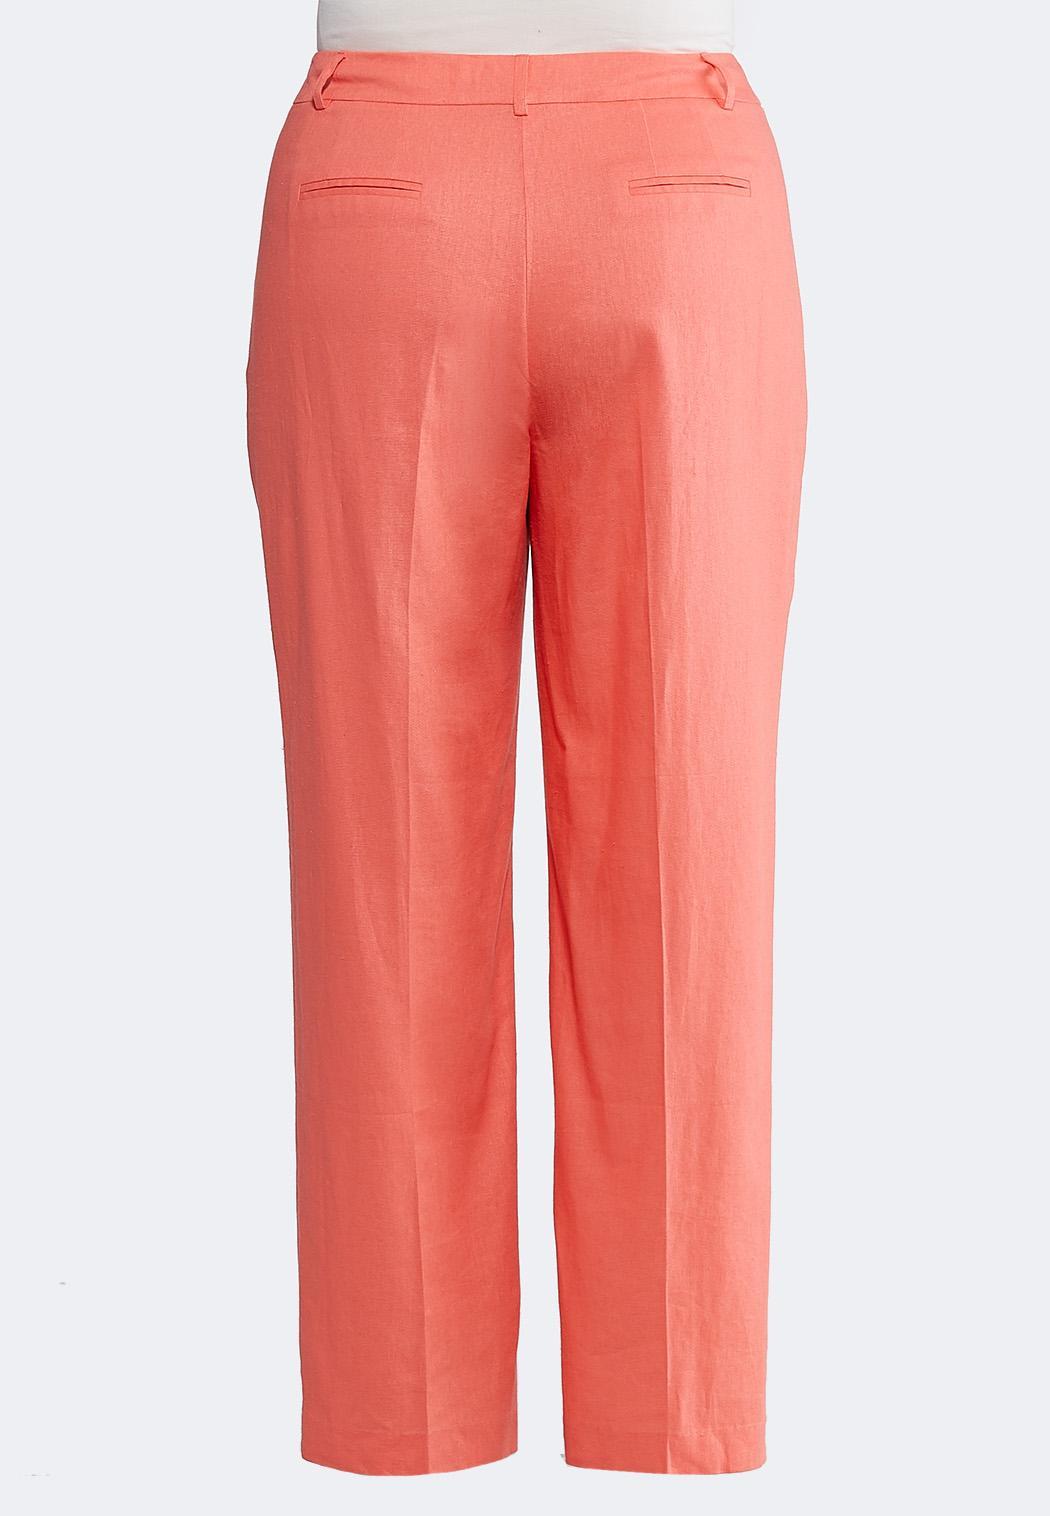 fc0a38aba79 Plus Size Linen Trouser Pants Wide Leg Cato Fashions